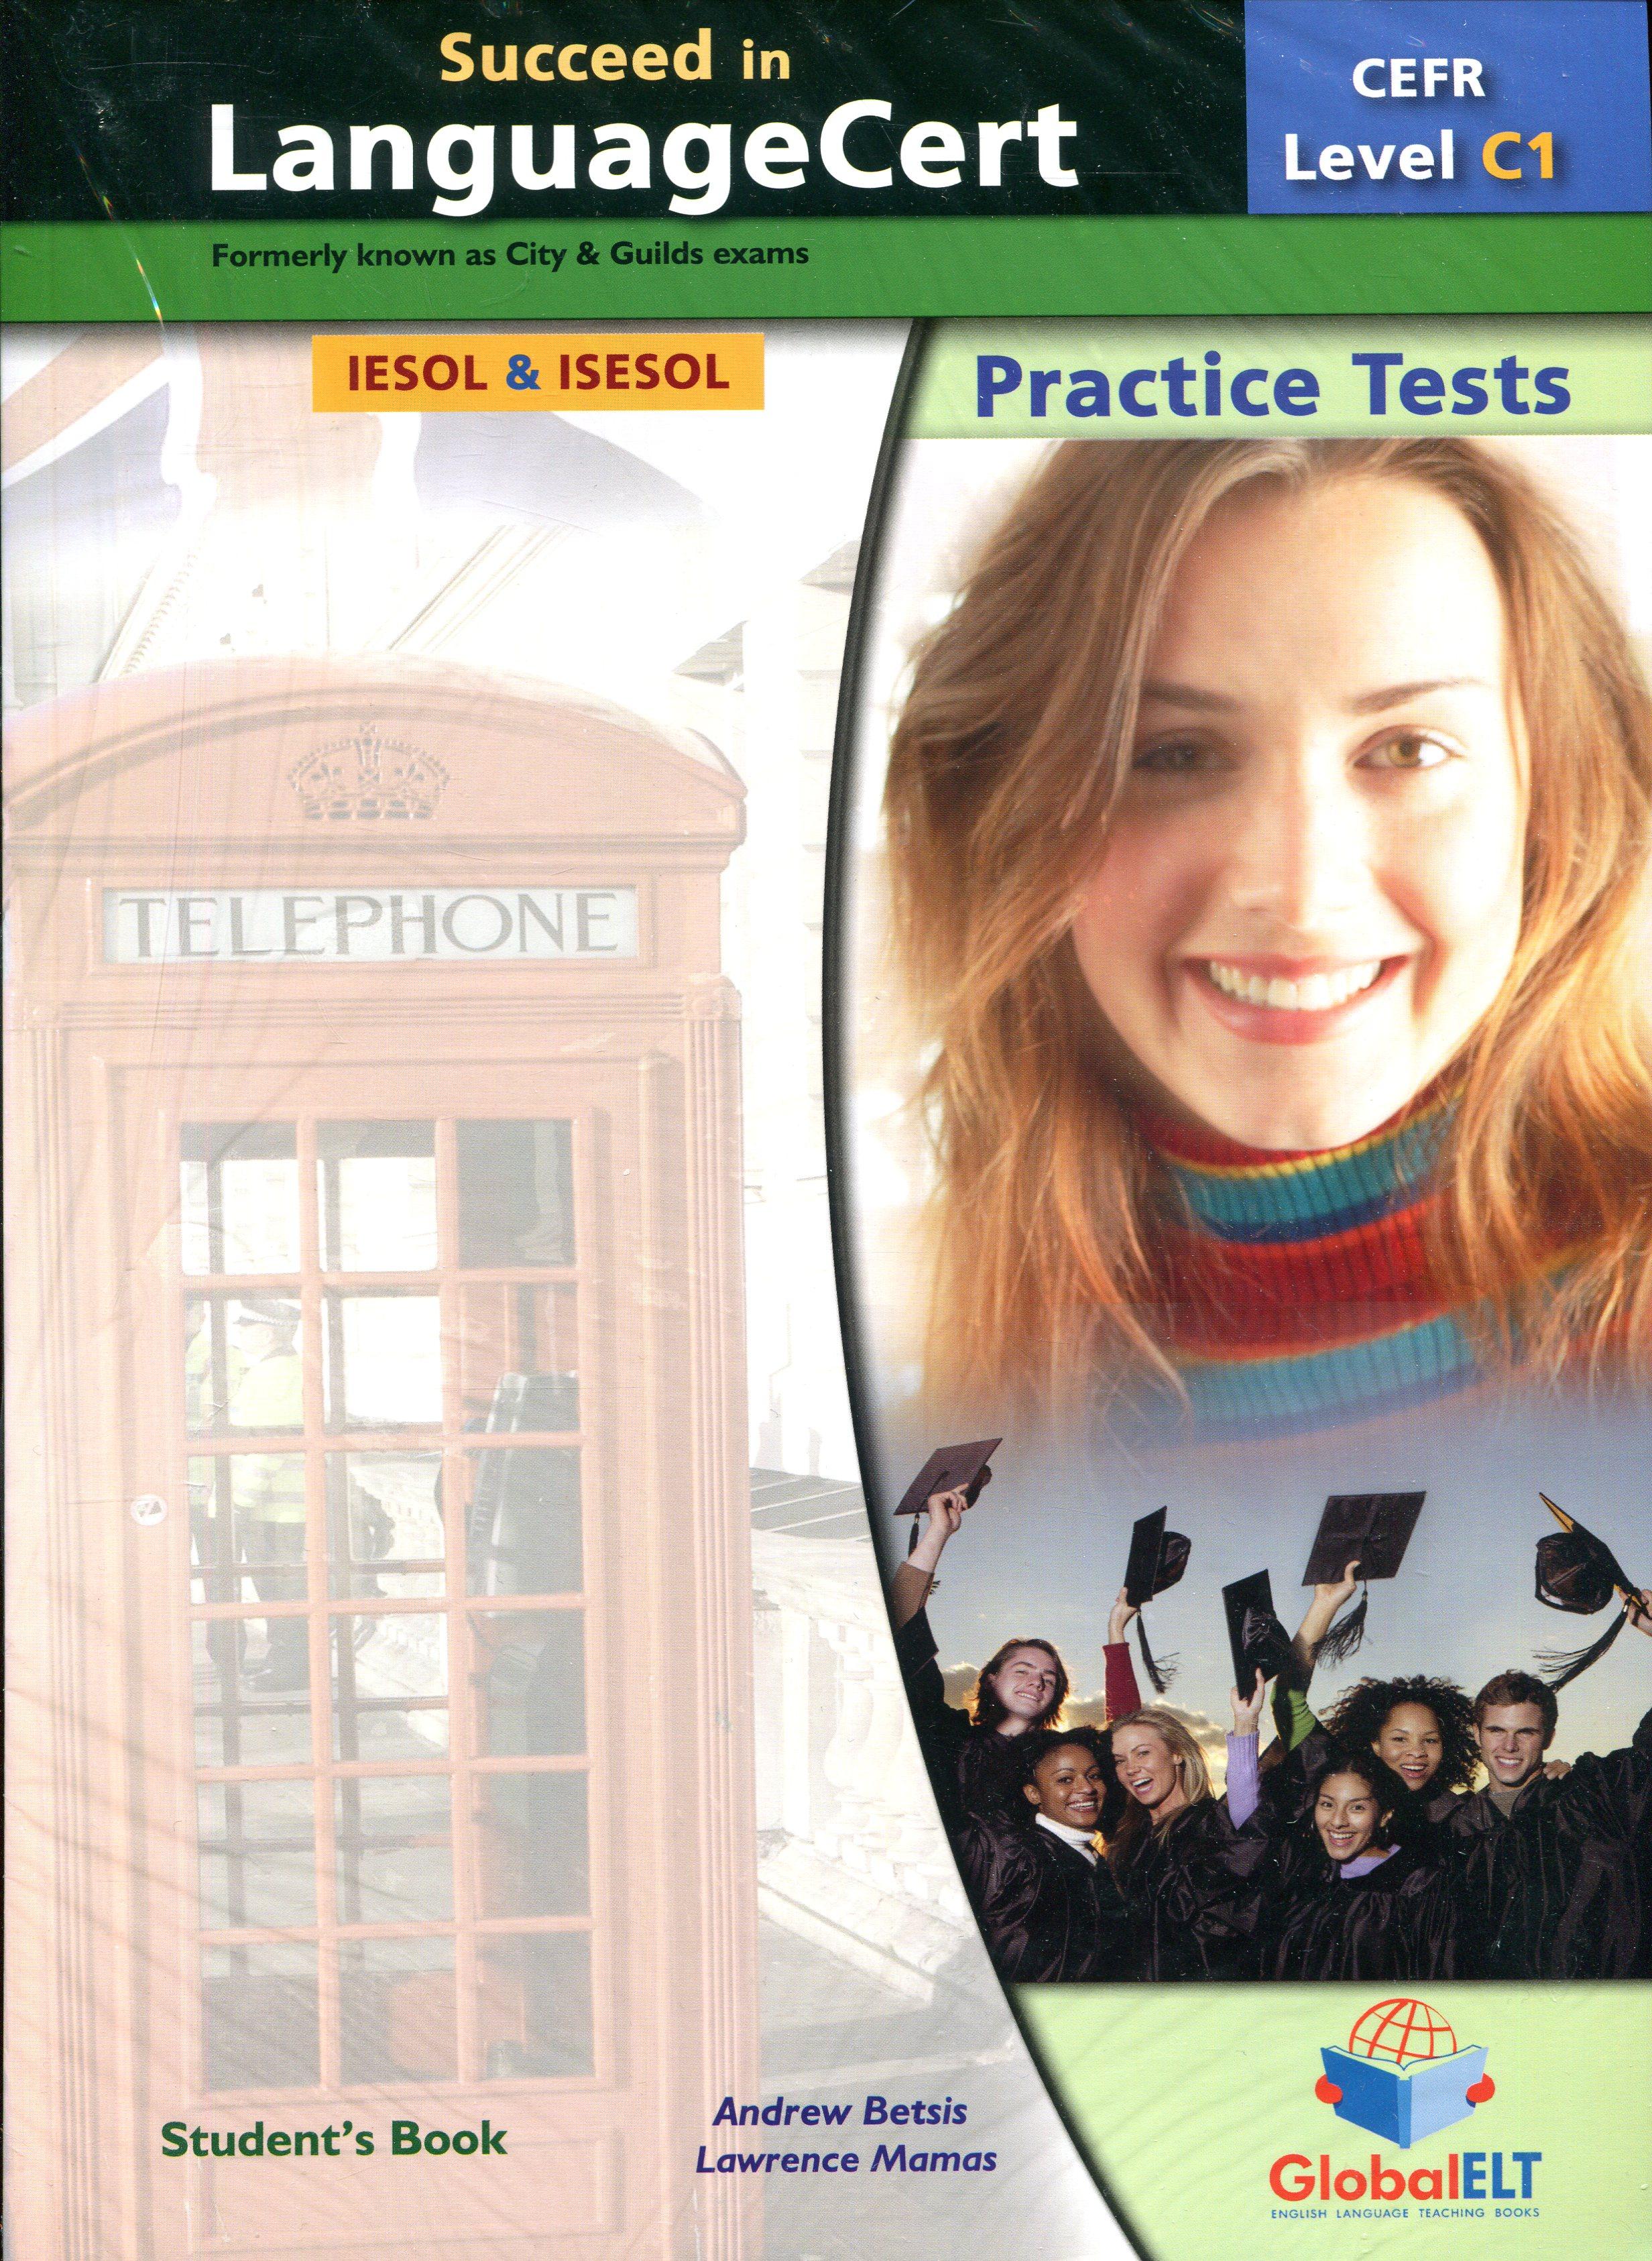 Succeed in LanguageCert - CEFR C1 - Practice Tests  - Self-study Edition